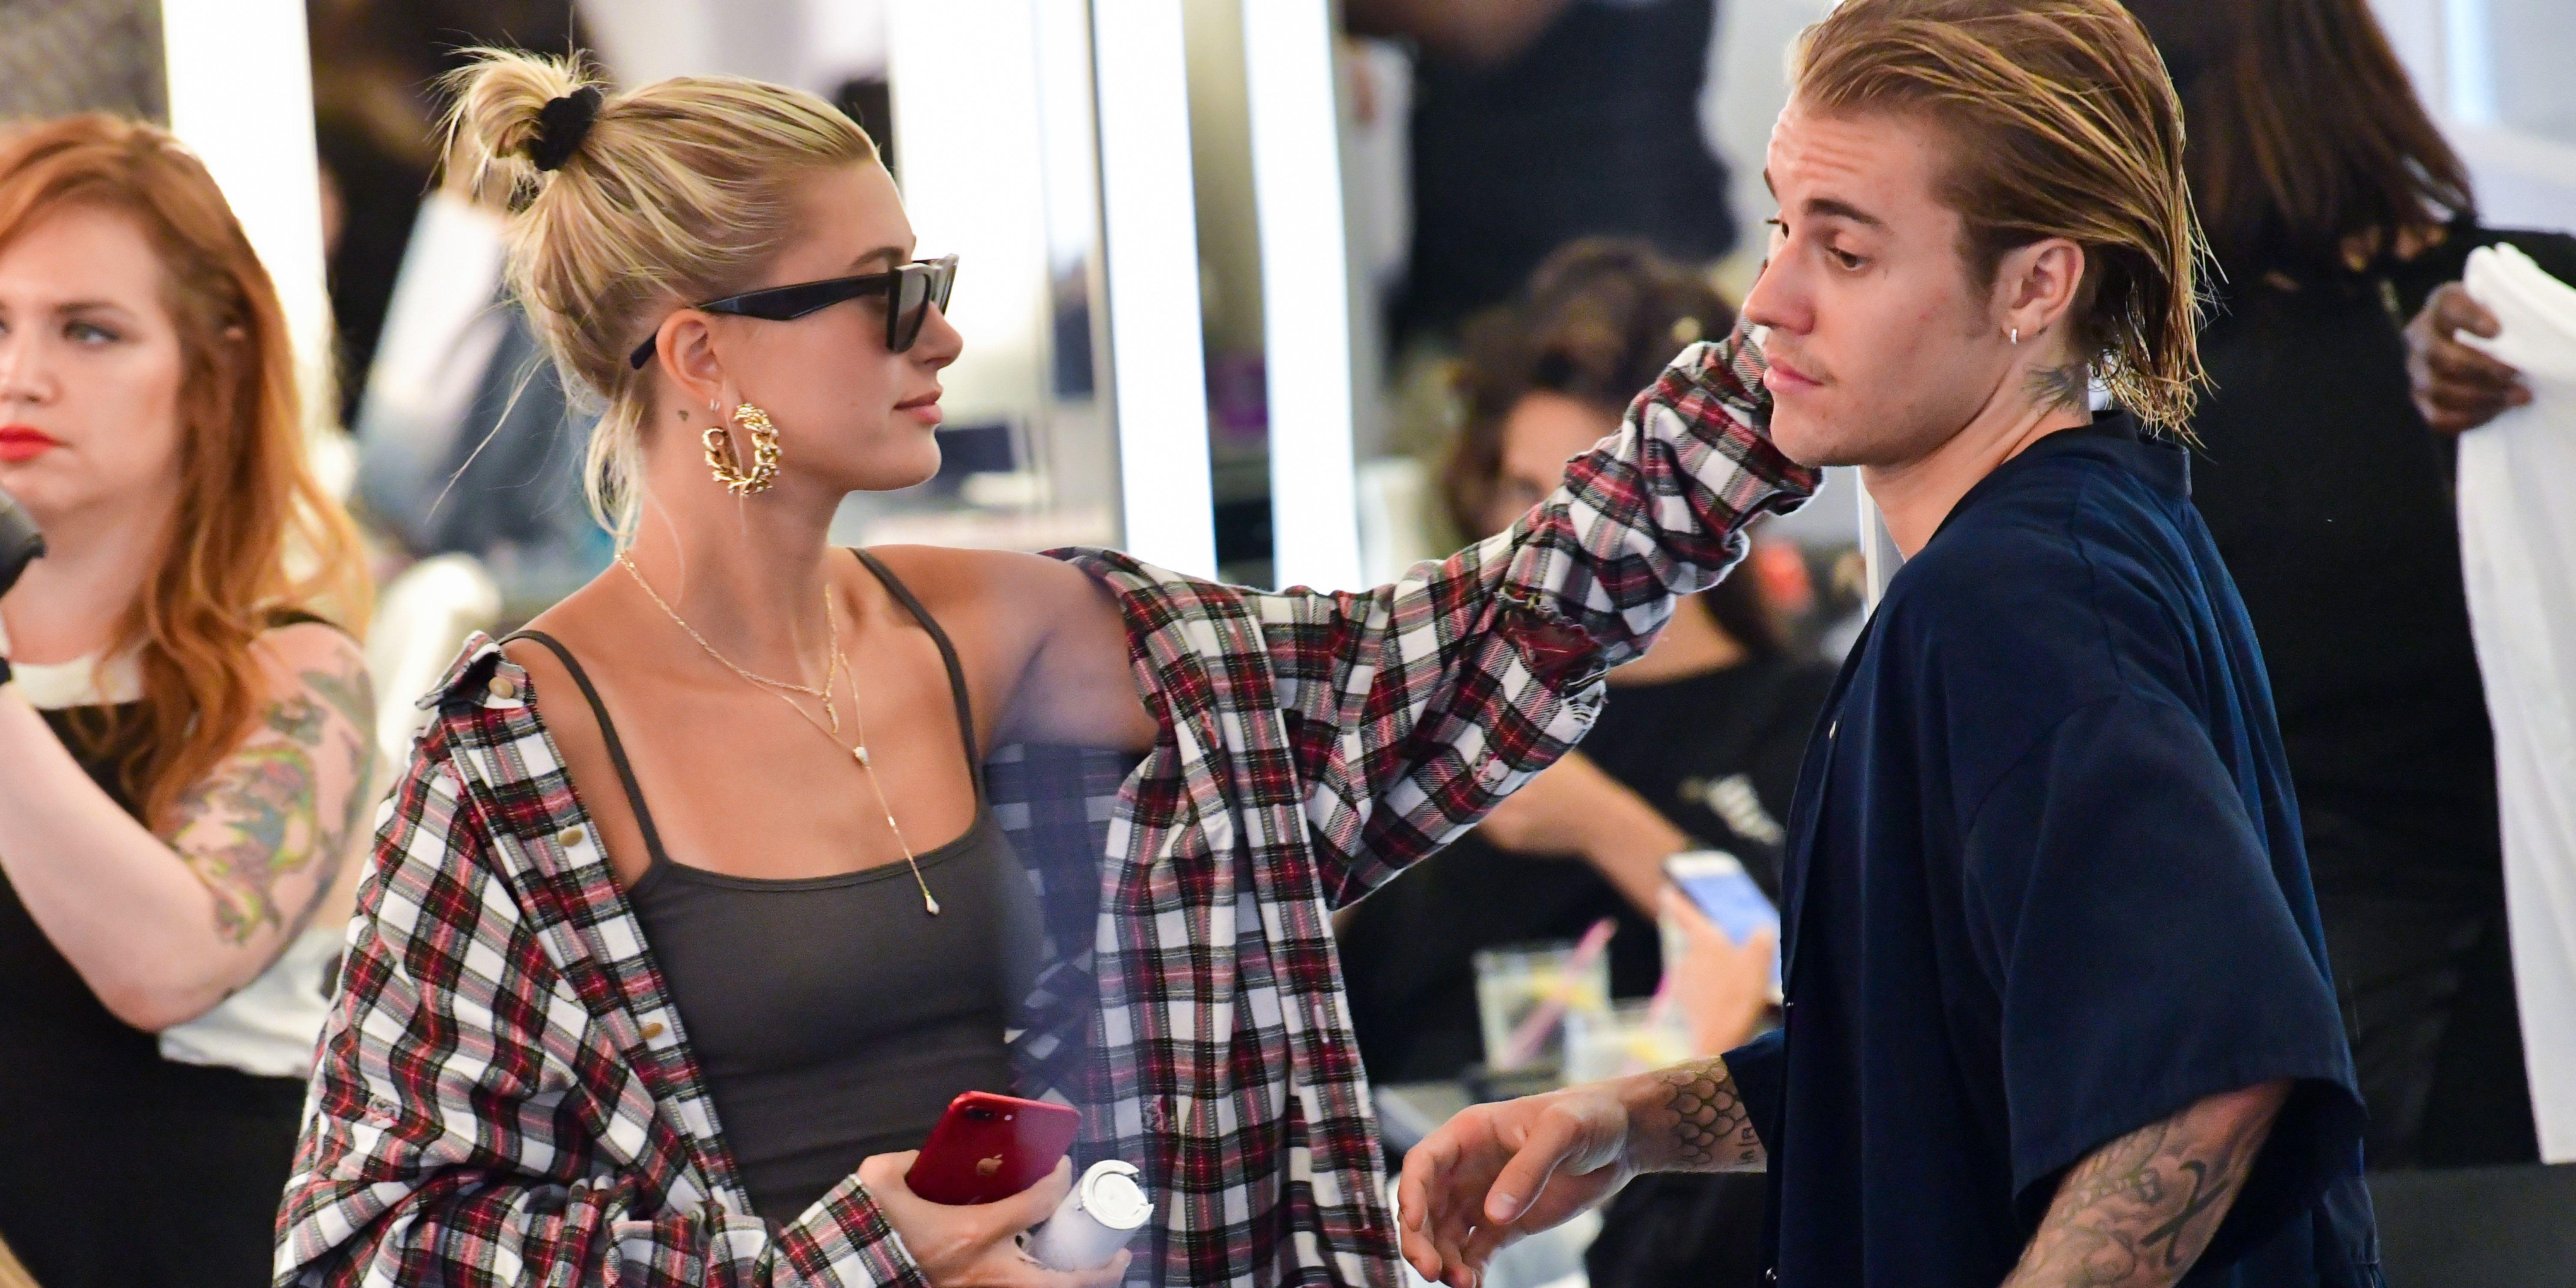 Justin Bieber Succumbs And Gets Haircut With Hailey Baldwin